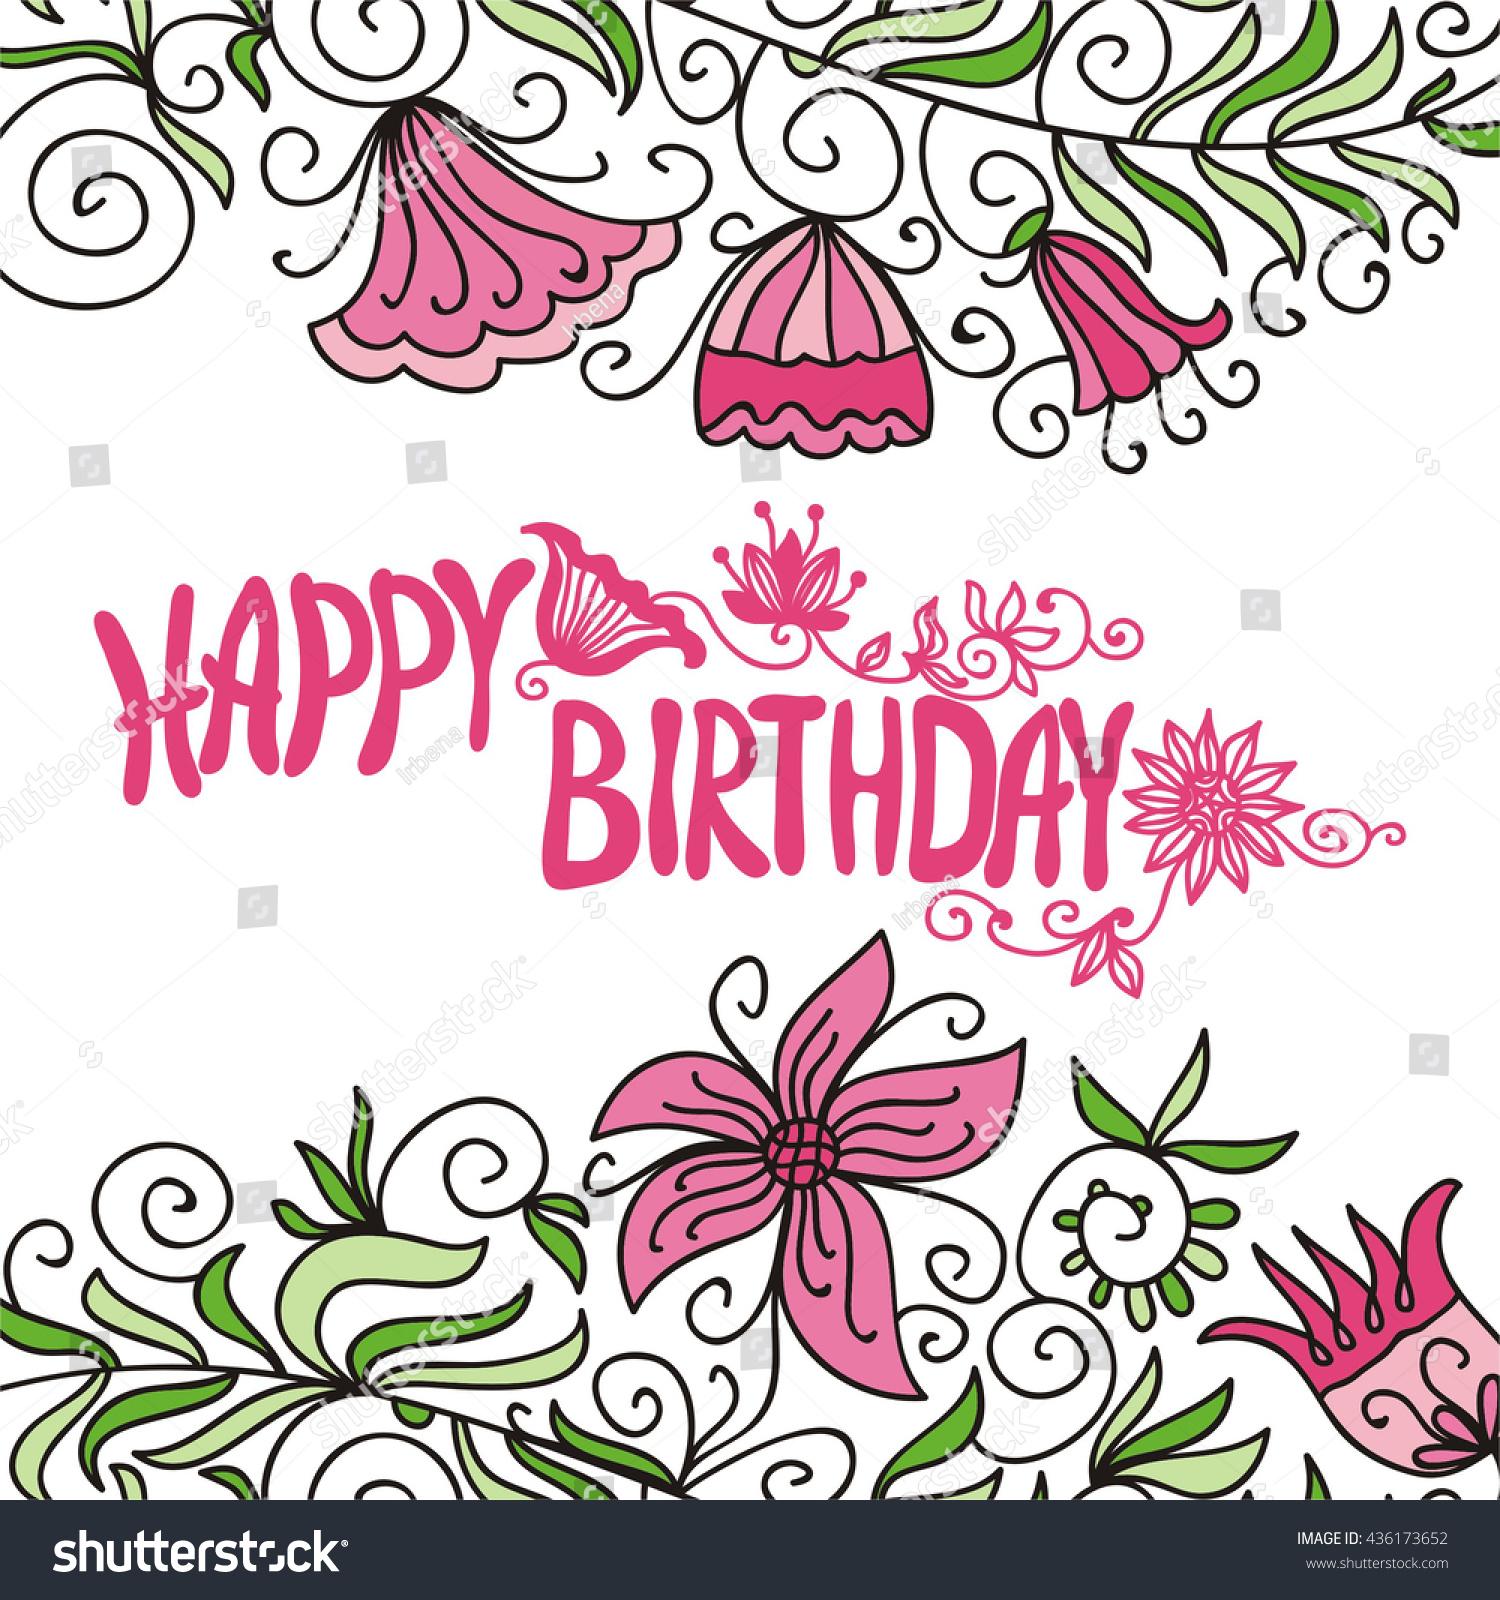 Happy birthday greeting card beautiful flowers stock vector happy birthday greeting card with beautiful flowers vector illustration izmirmasajfo